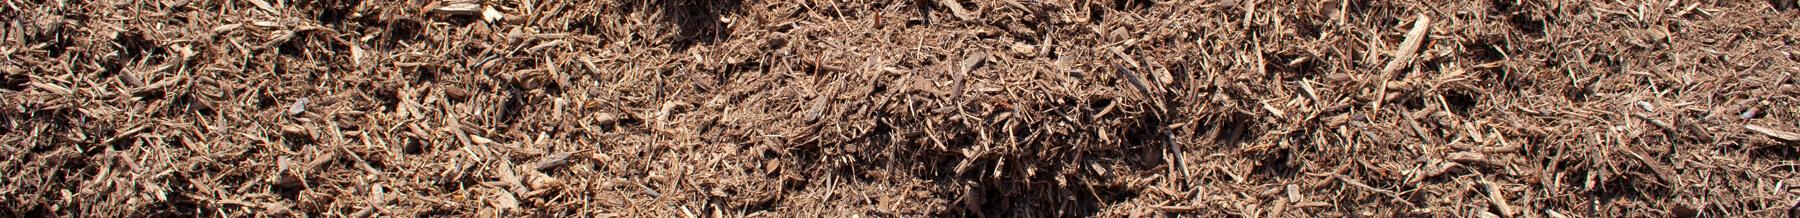 close up wide shot of kiddie cushion mulch